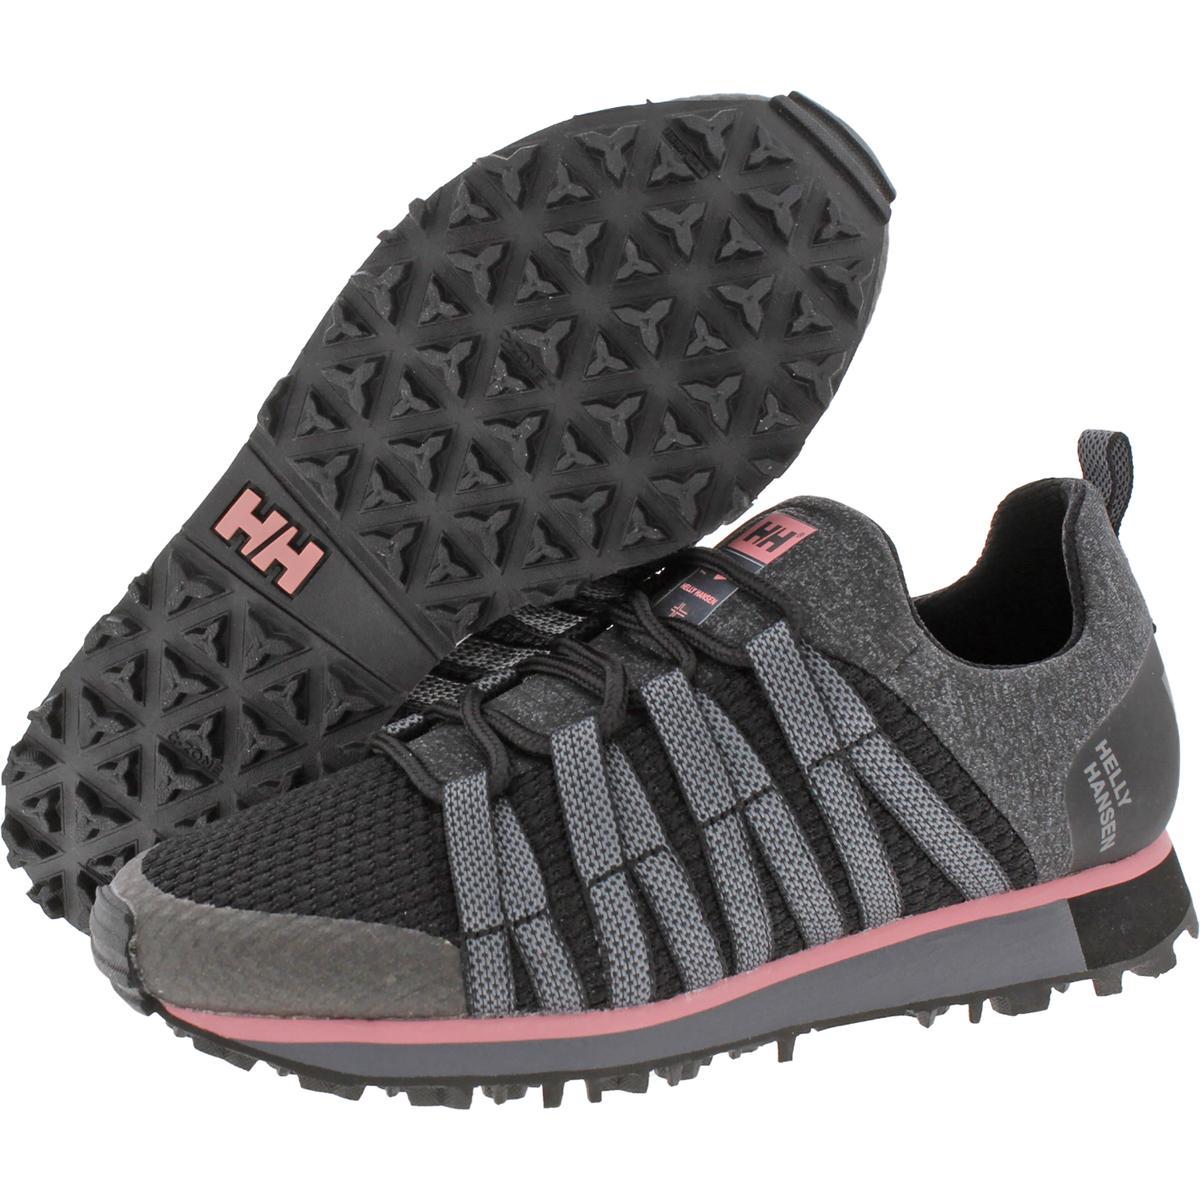 thumbnail 5 - Helly-Hansen-Womens-Vardapeak-V2-Fitness-Performance-Sneakers-Shoes-BHFO-9846